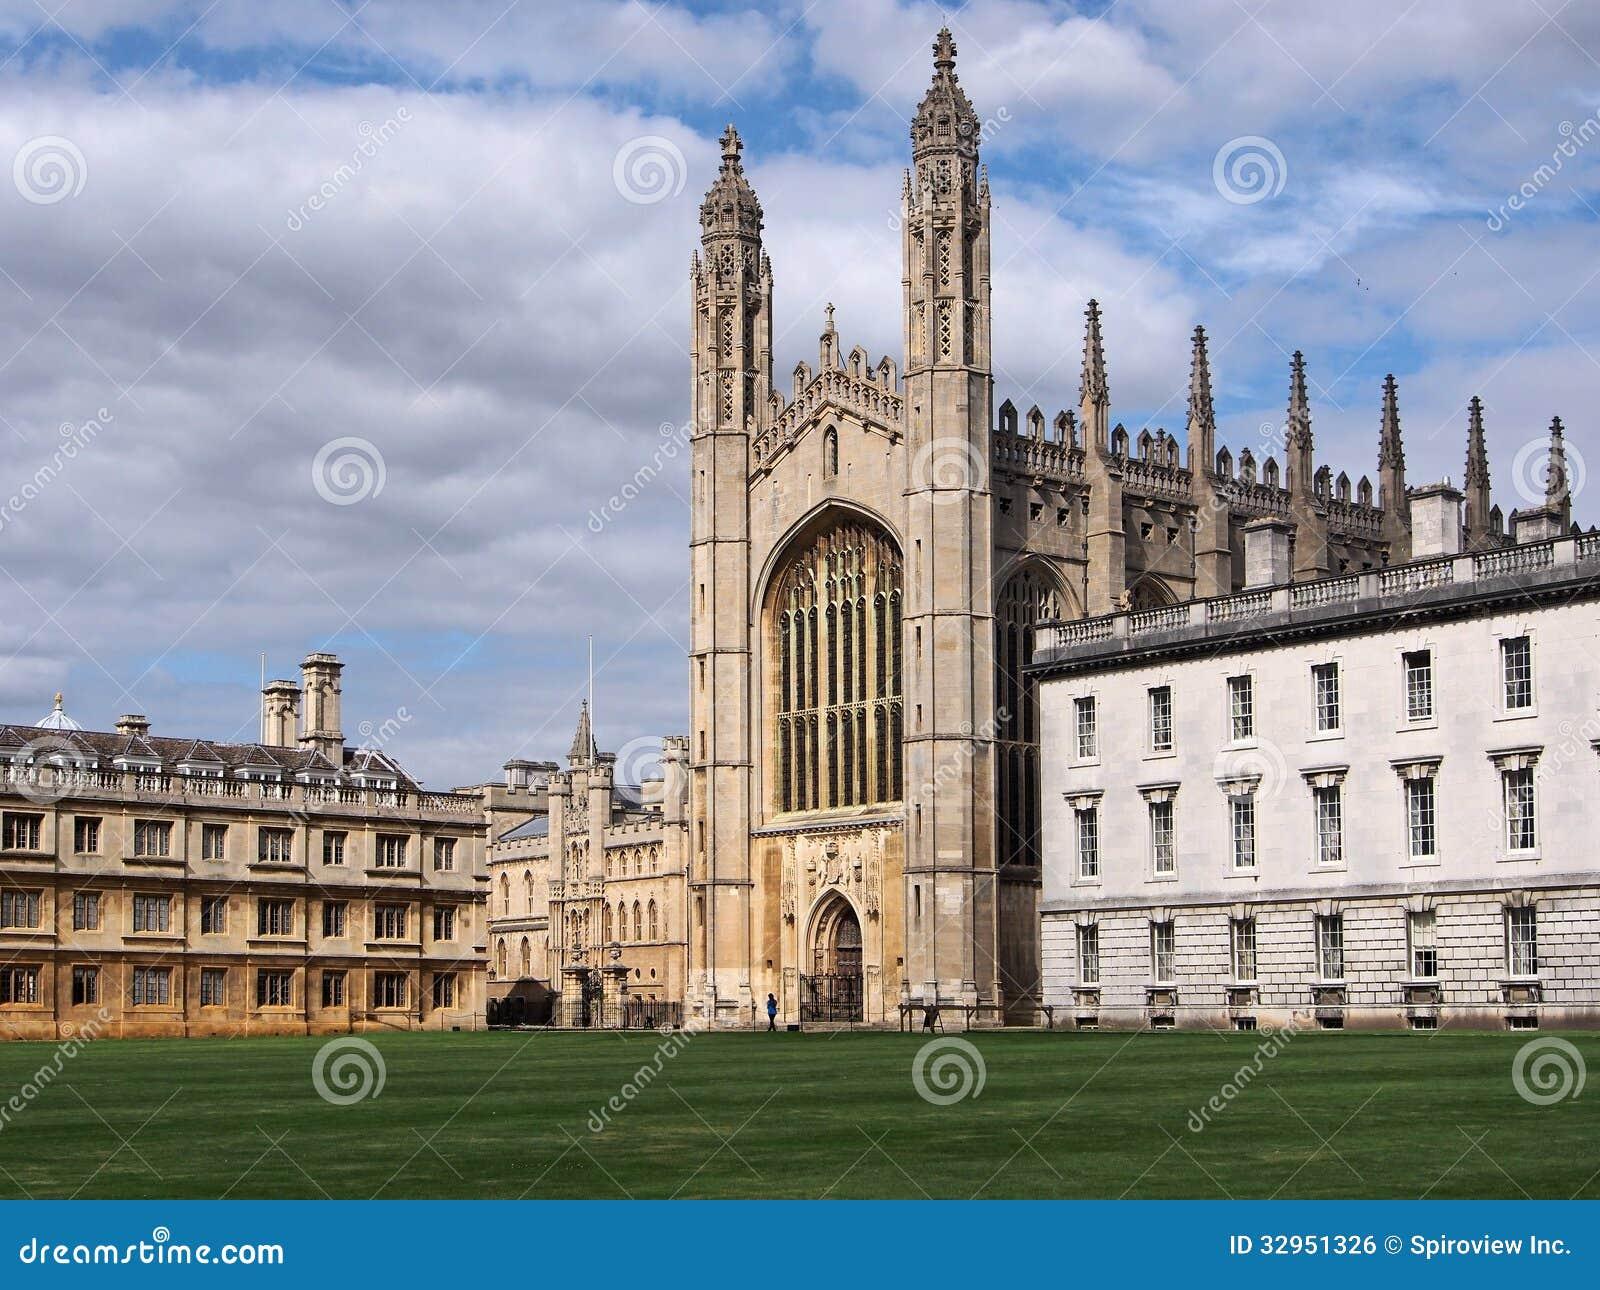 King's College, Cambridge University Stock Photo - Image of